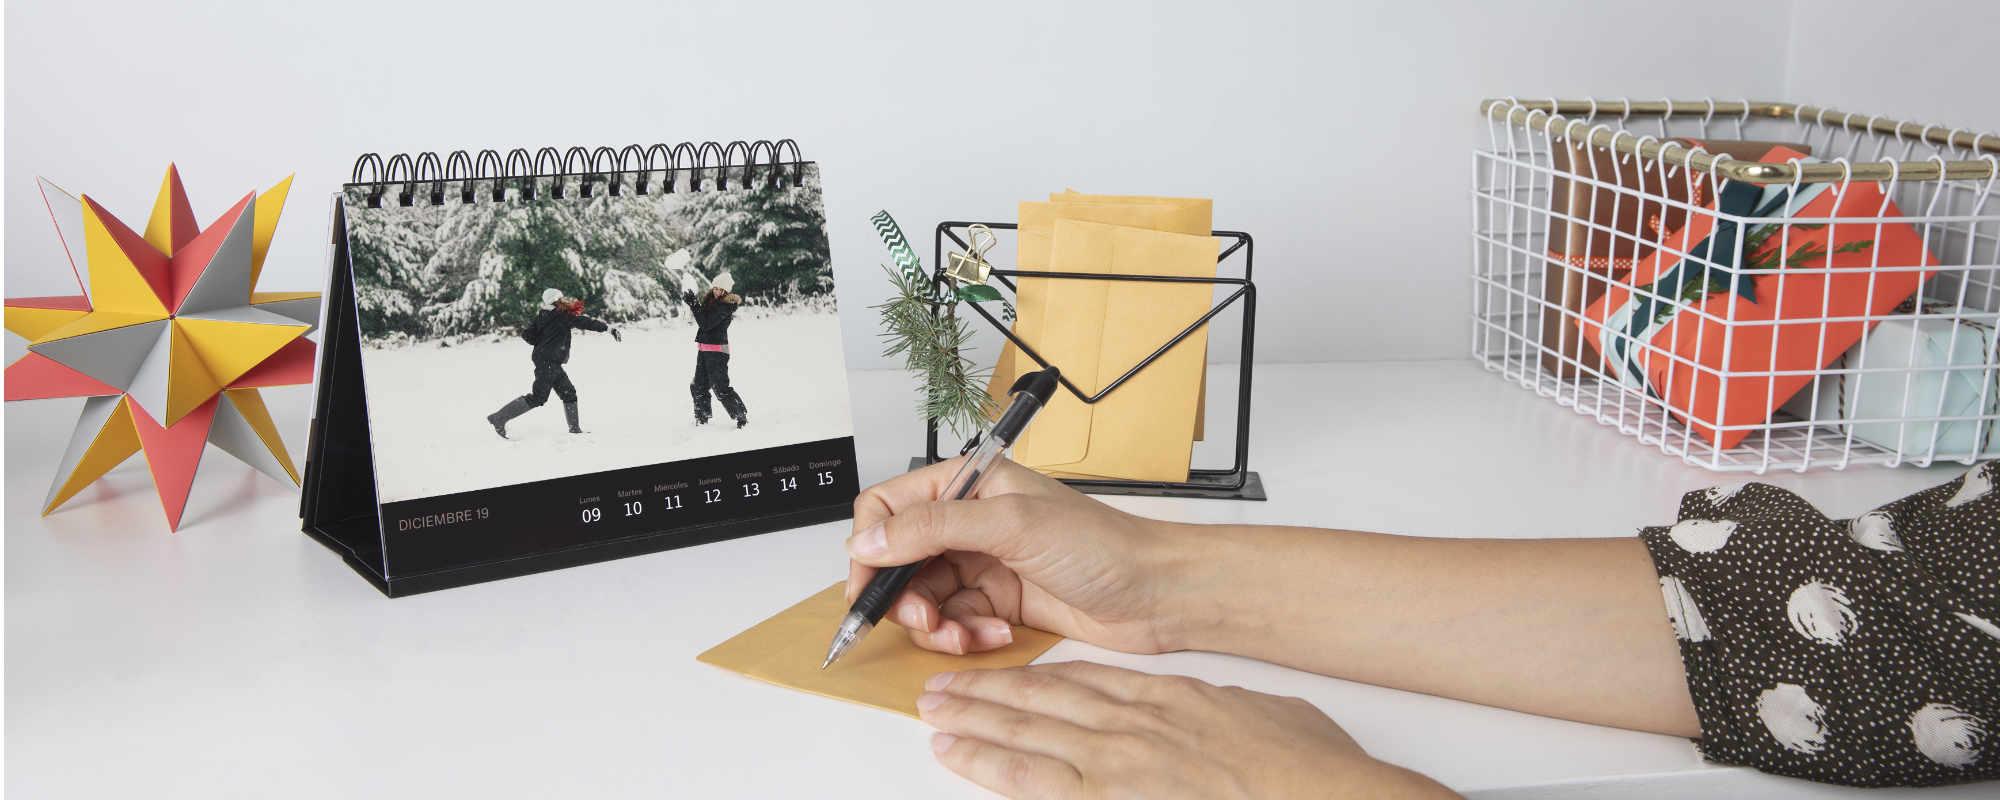 calendario 2019 Hofmann